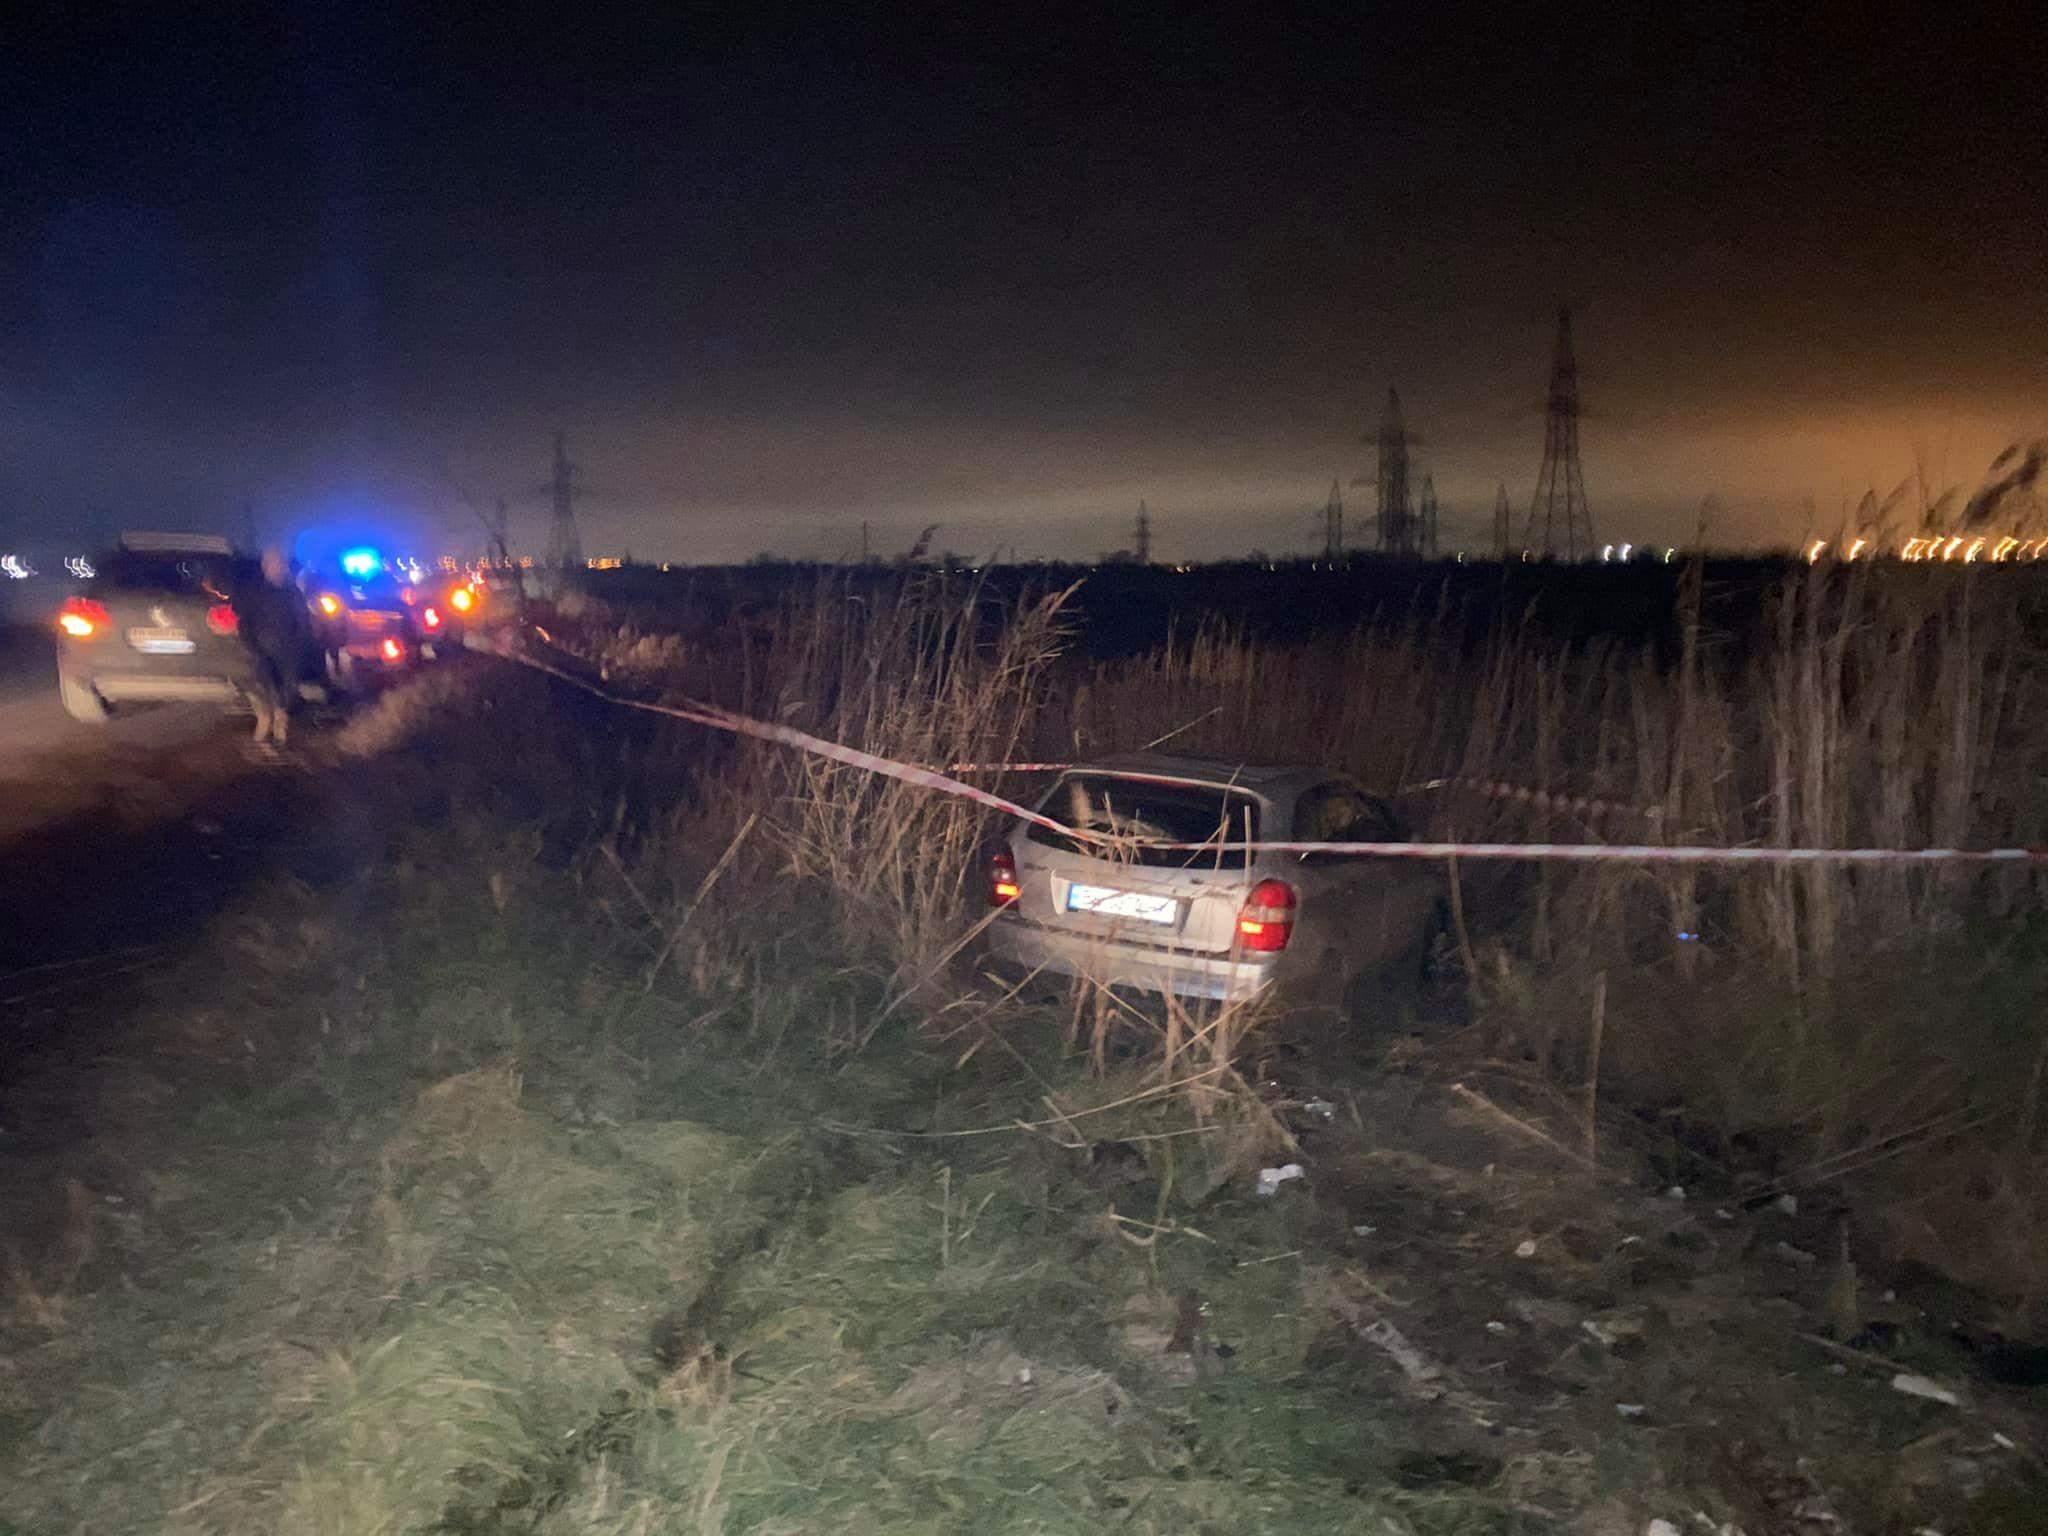 В Одесі сталася жахлива ДТП волонтери загинули